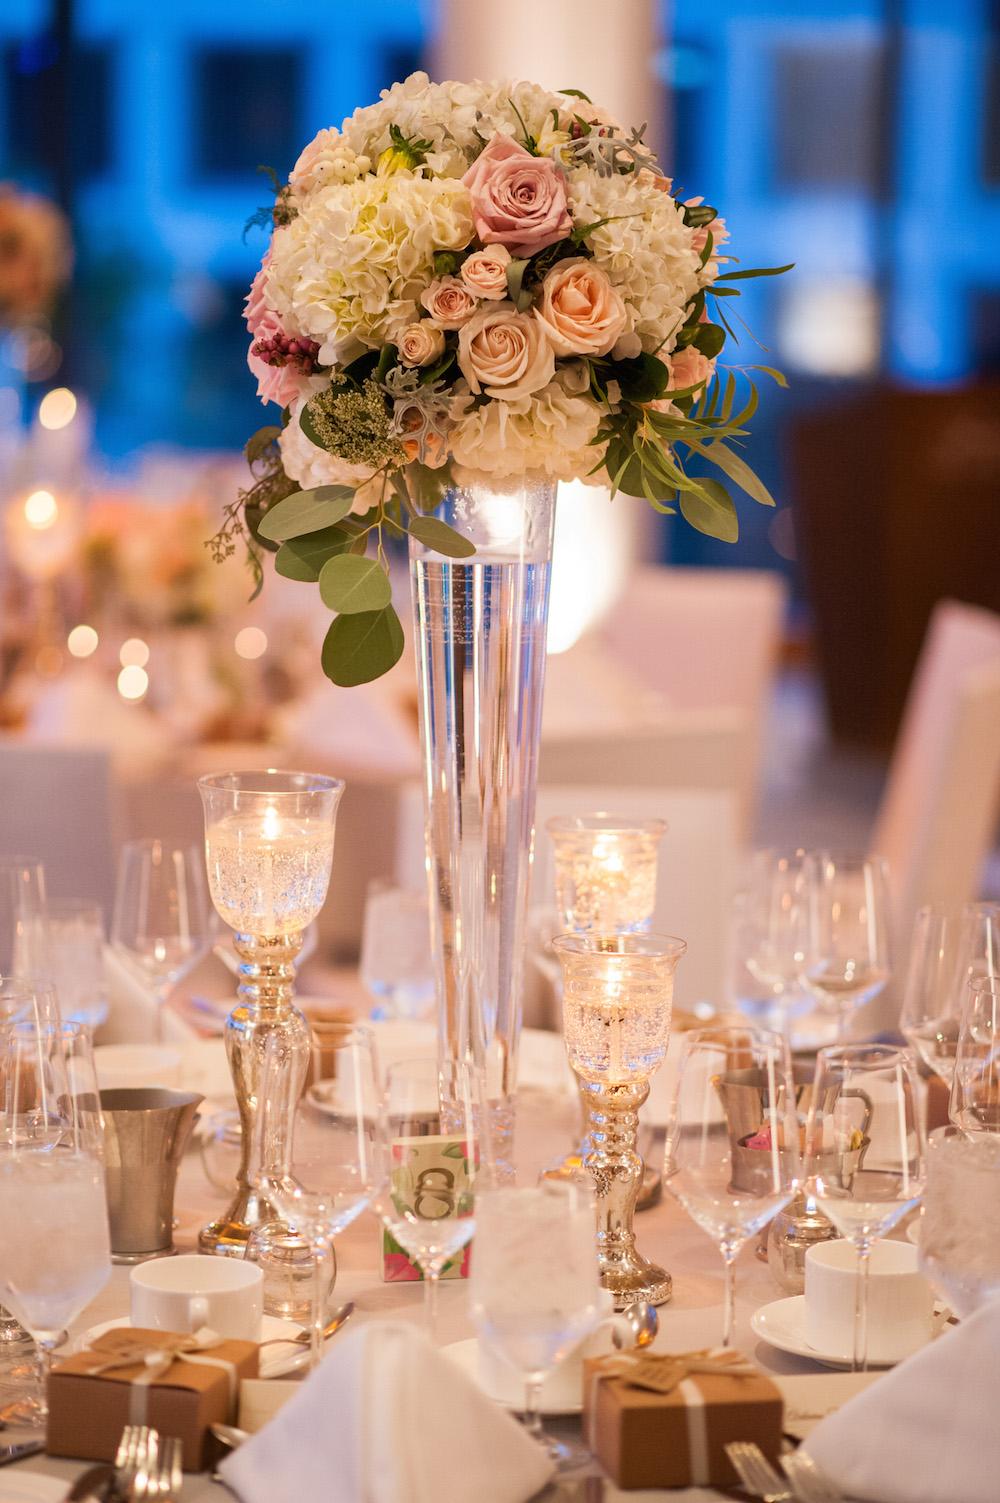 victoria-wedding-photographers-fairmont-pacific-rim-wedding-64.jpg